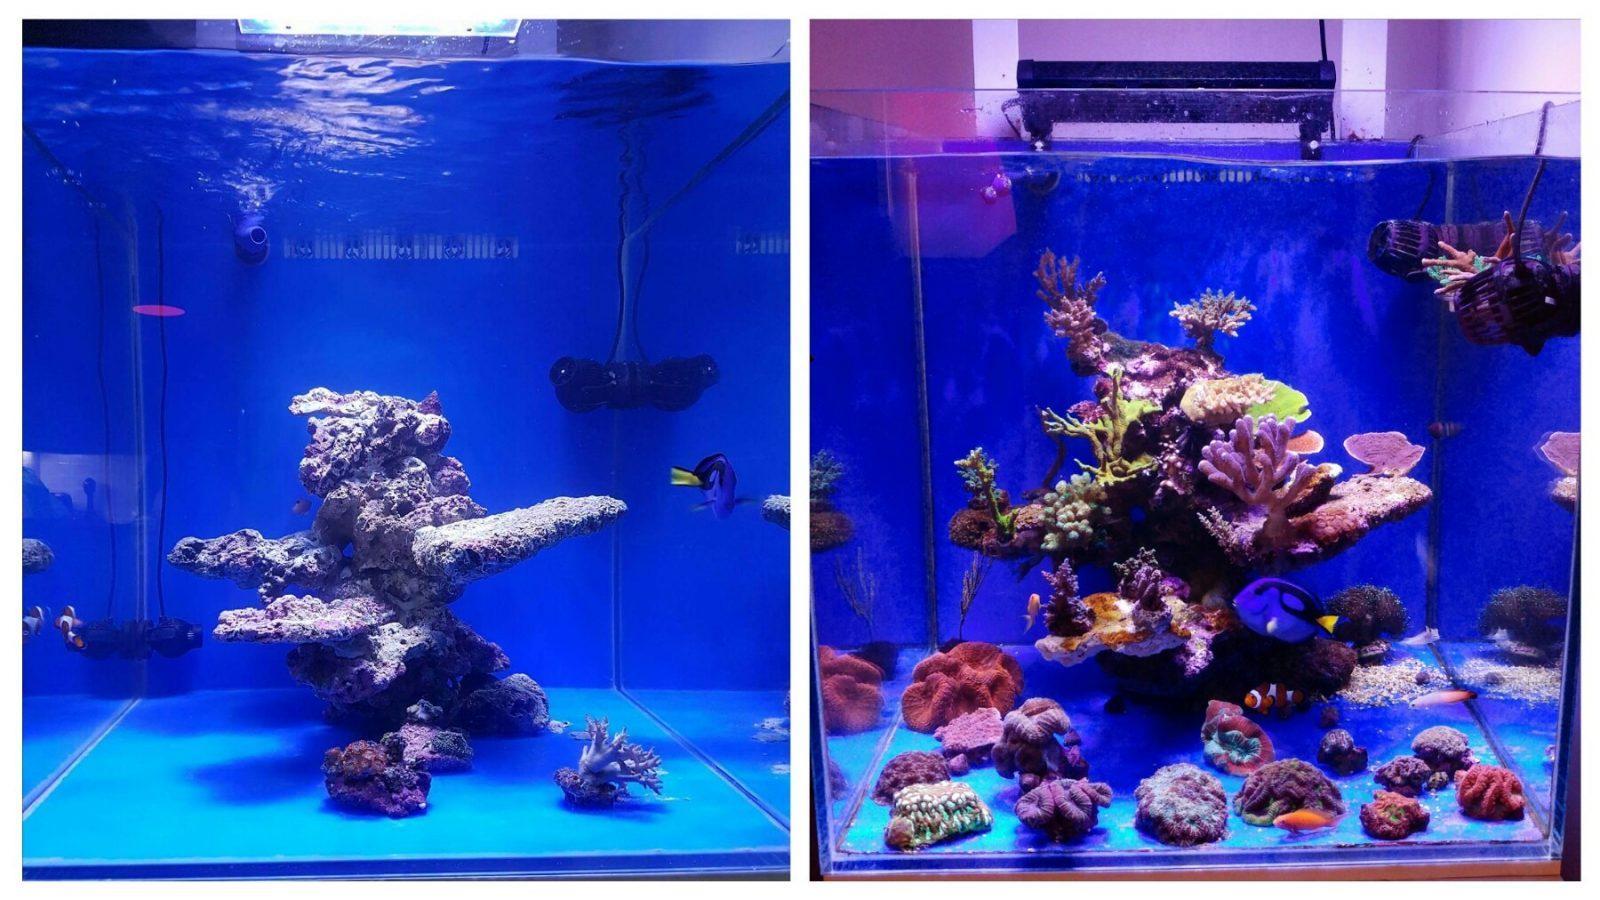 korallenfarbe wachstum unter atlantik compact aquarium led beleuchtung orphek. Black Bedroom Furniture Sets. Home Design Ideas